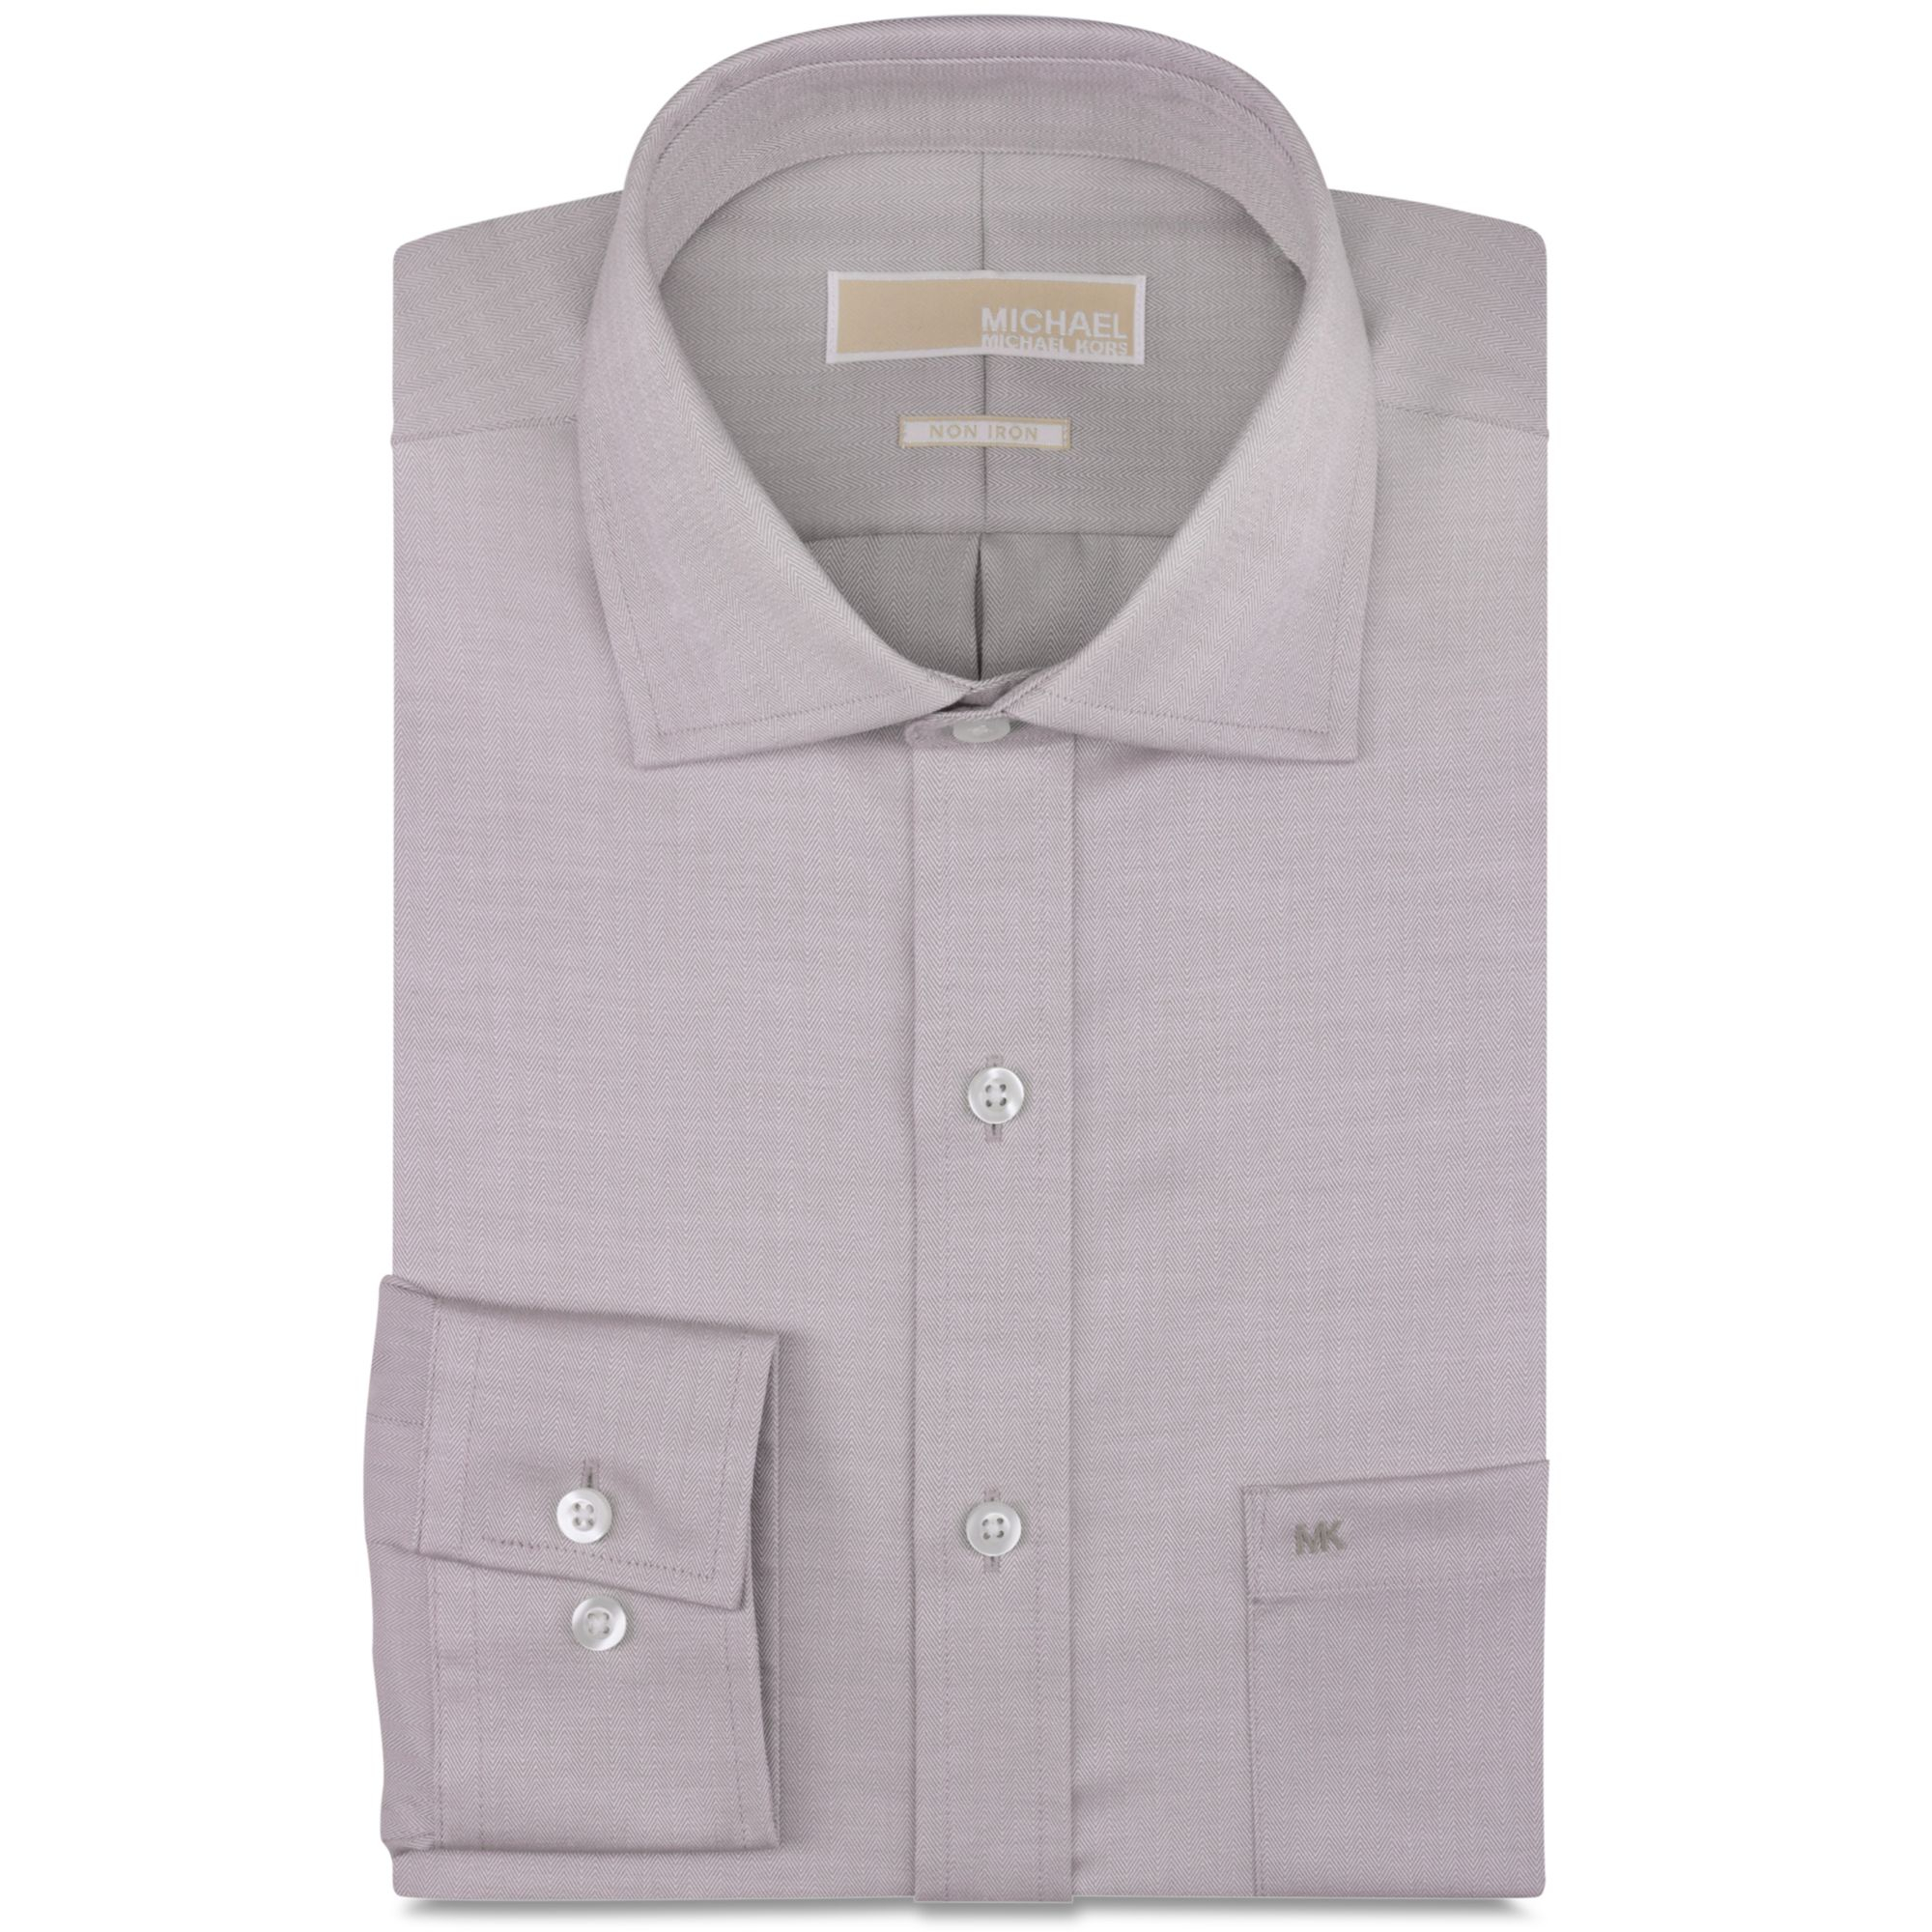 Michael kors michael no iron chino solid dress shirt in for No iron dress shirts for men